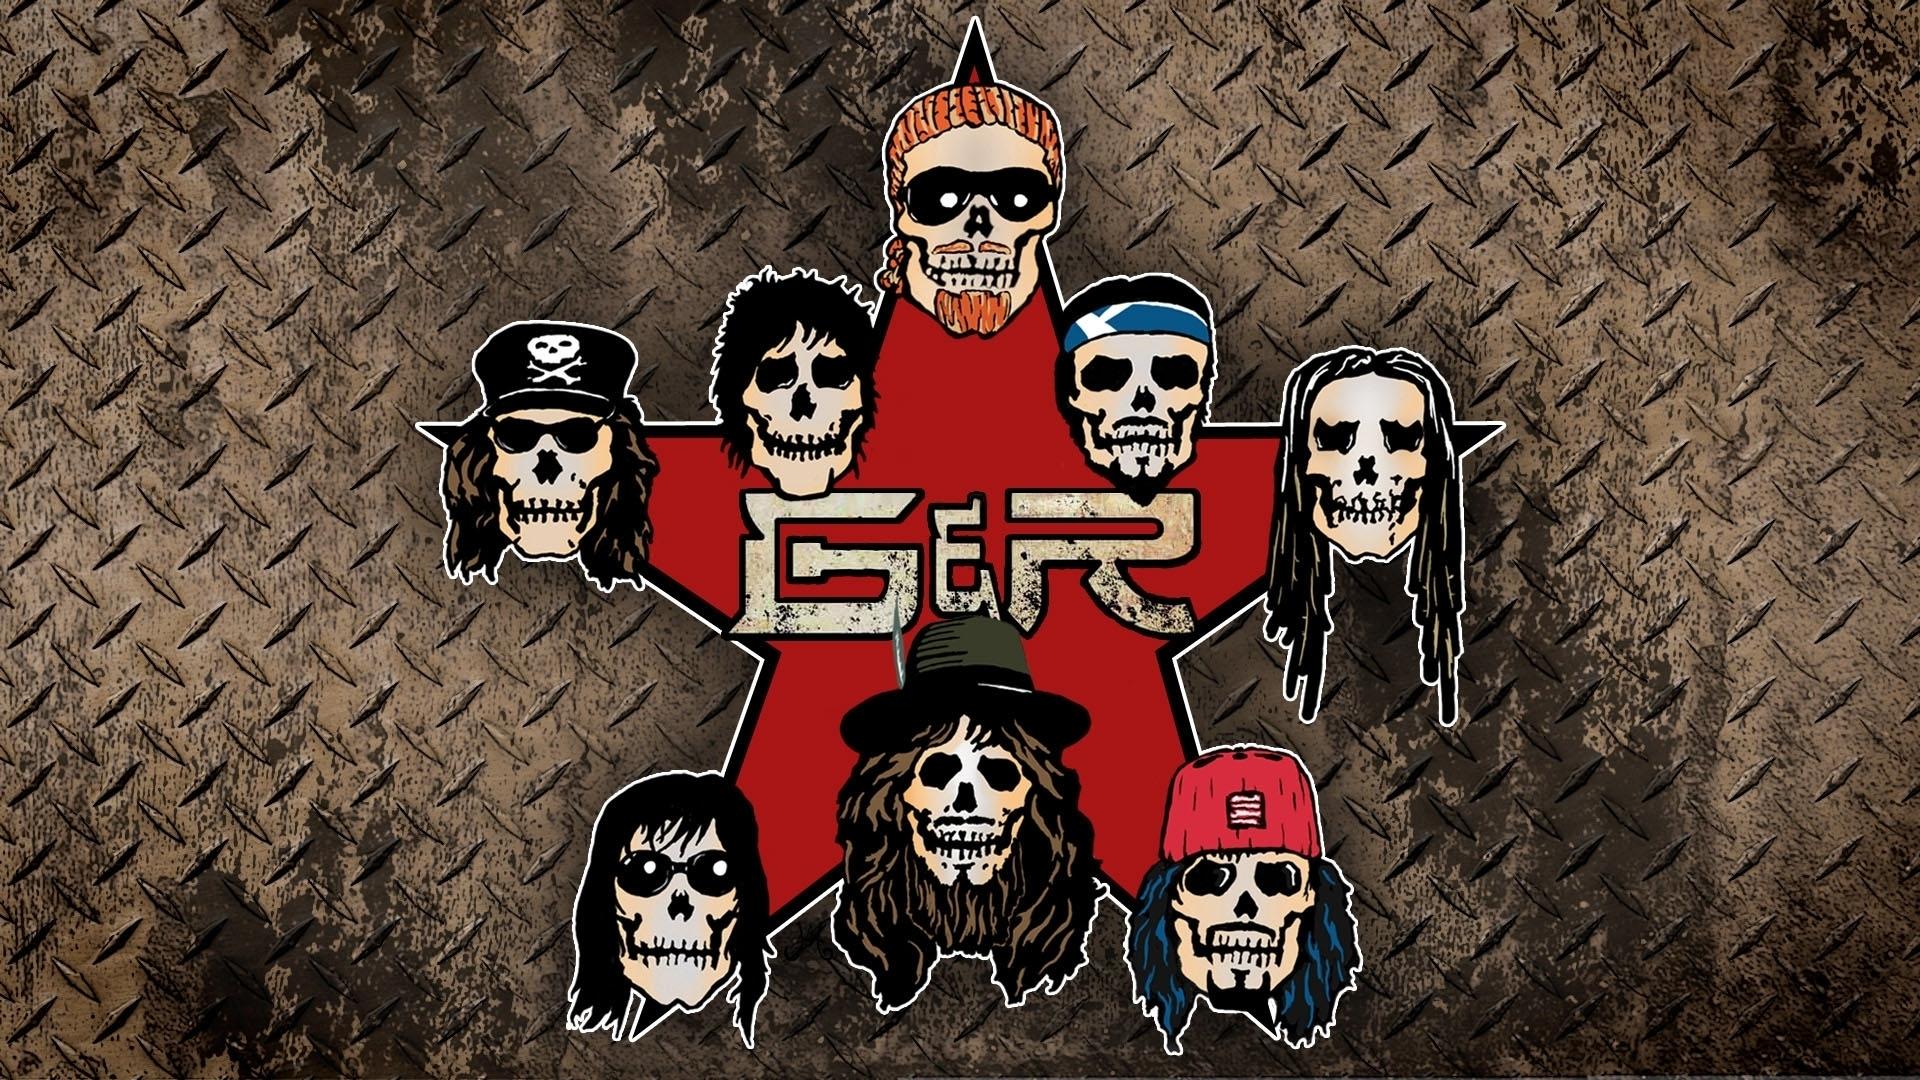 Guns N Roses Hd 9406 Hd Wallpaper